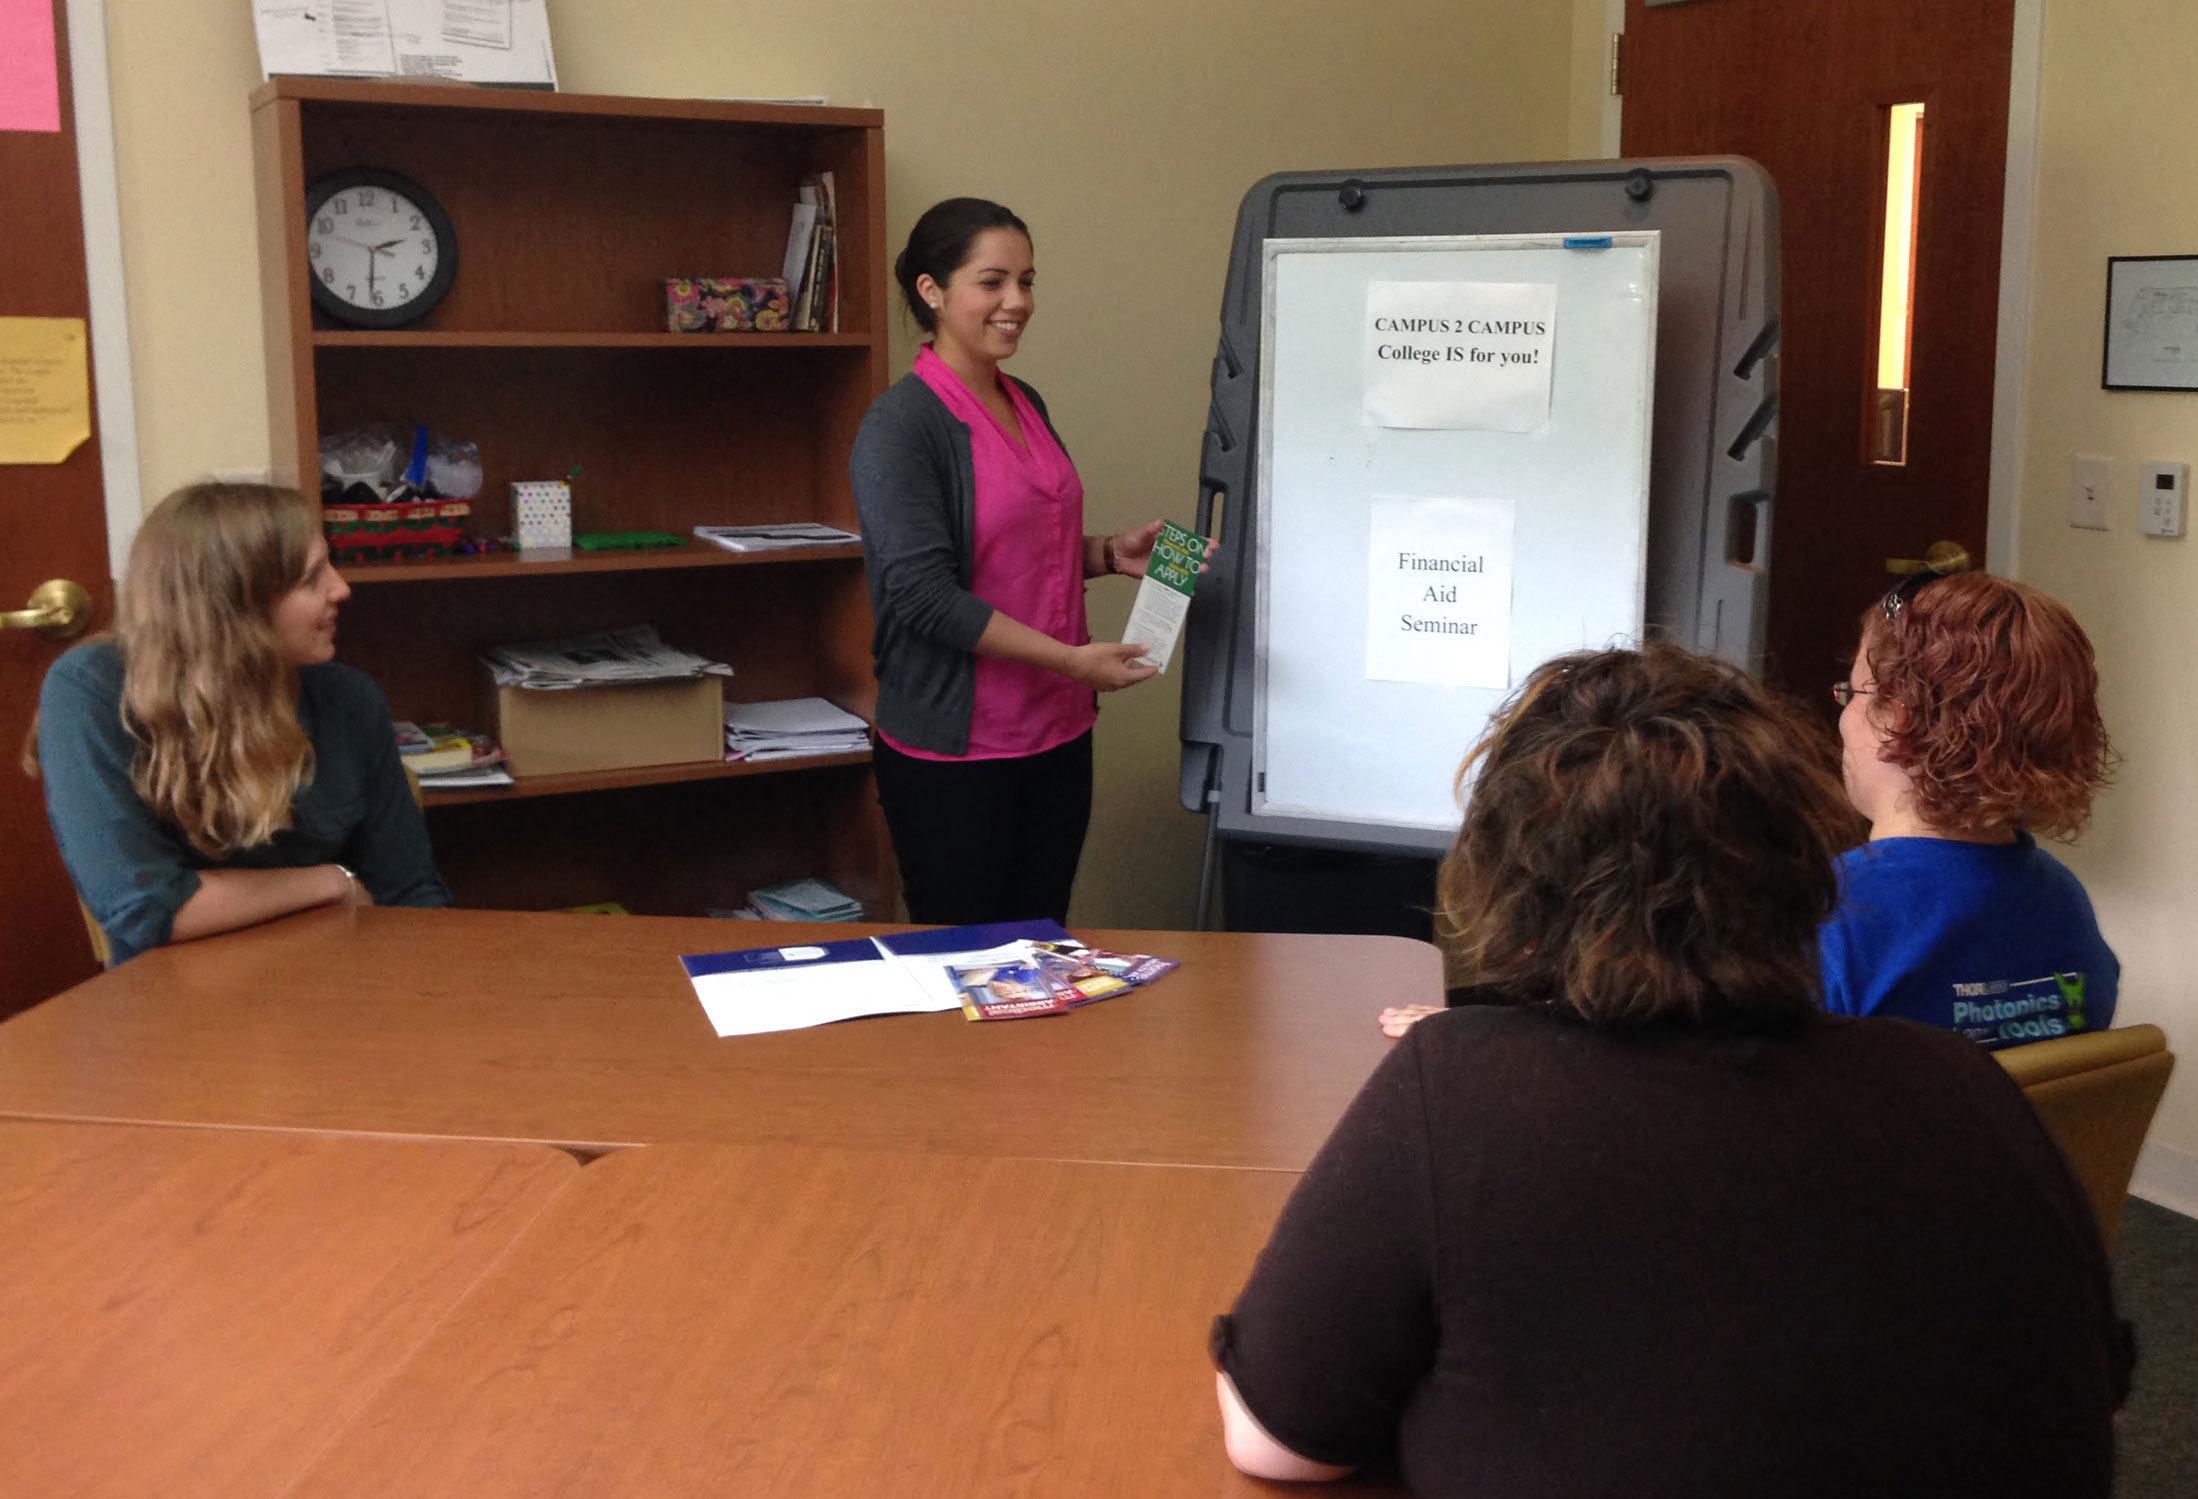 fc89fe5d8a2fea568bea_Campus-to-Campus-Program-Coordinator-Samantha-Seltmann-leads-an-Information-Session.jpg